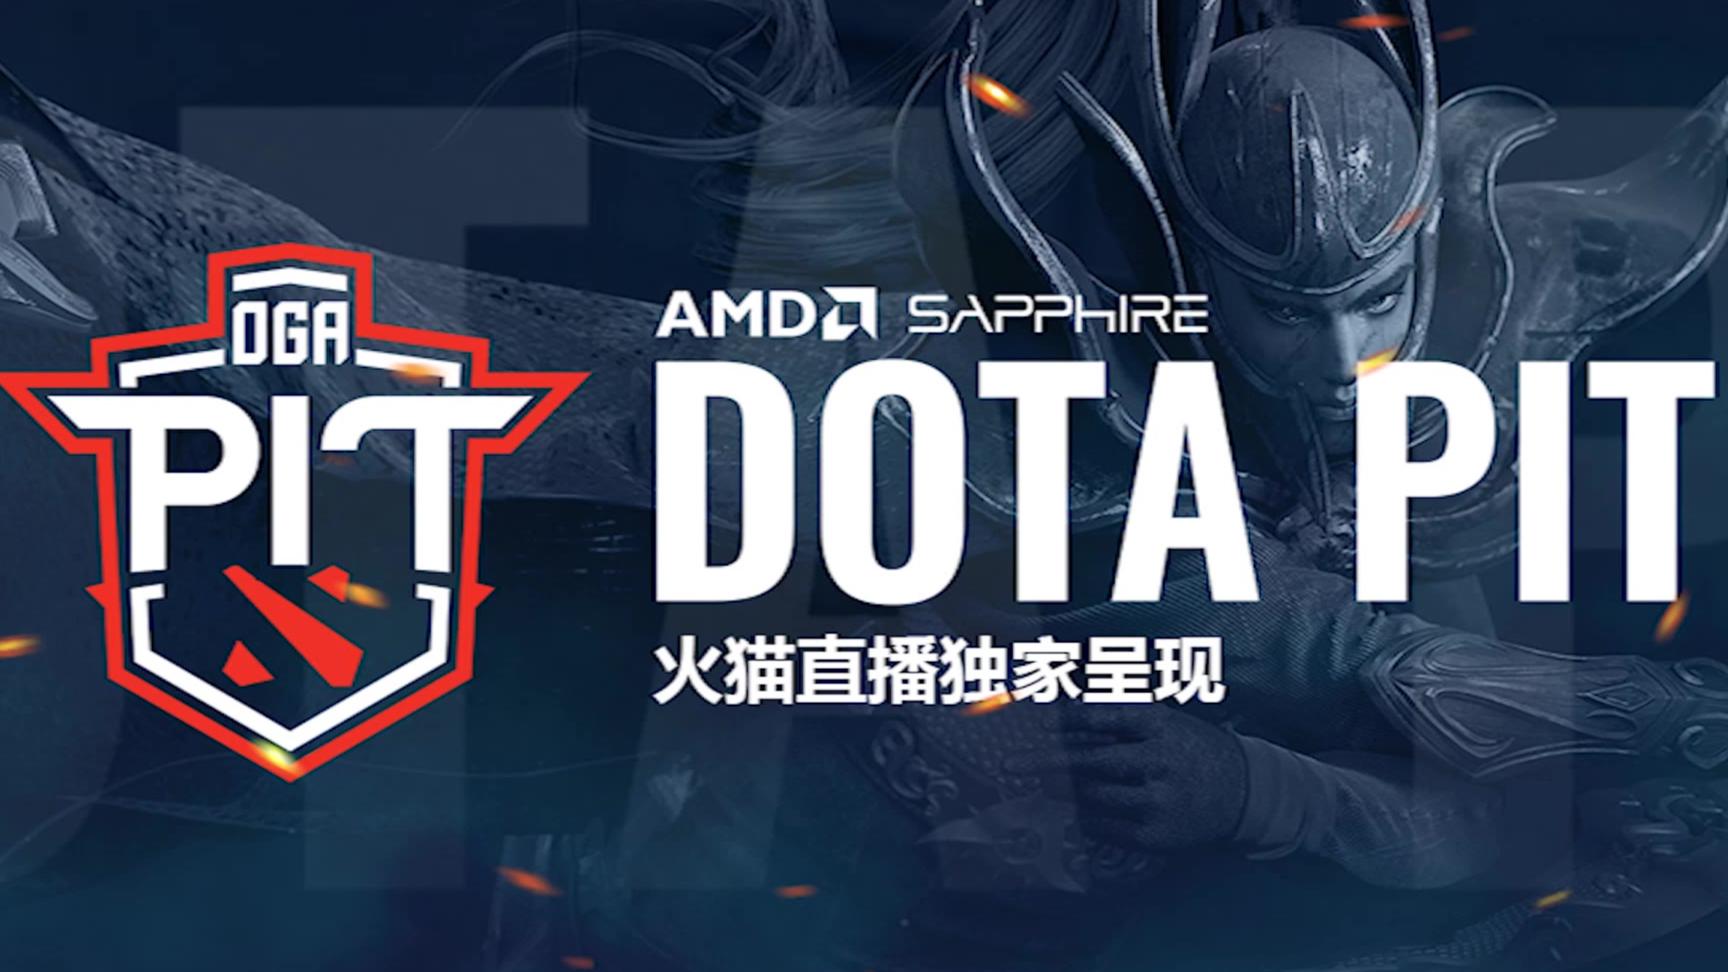 DOTA2:DOTAPIT欧洲区淘汰赛团战集锦01